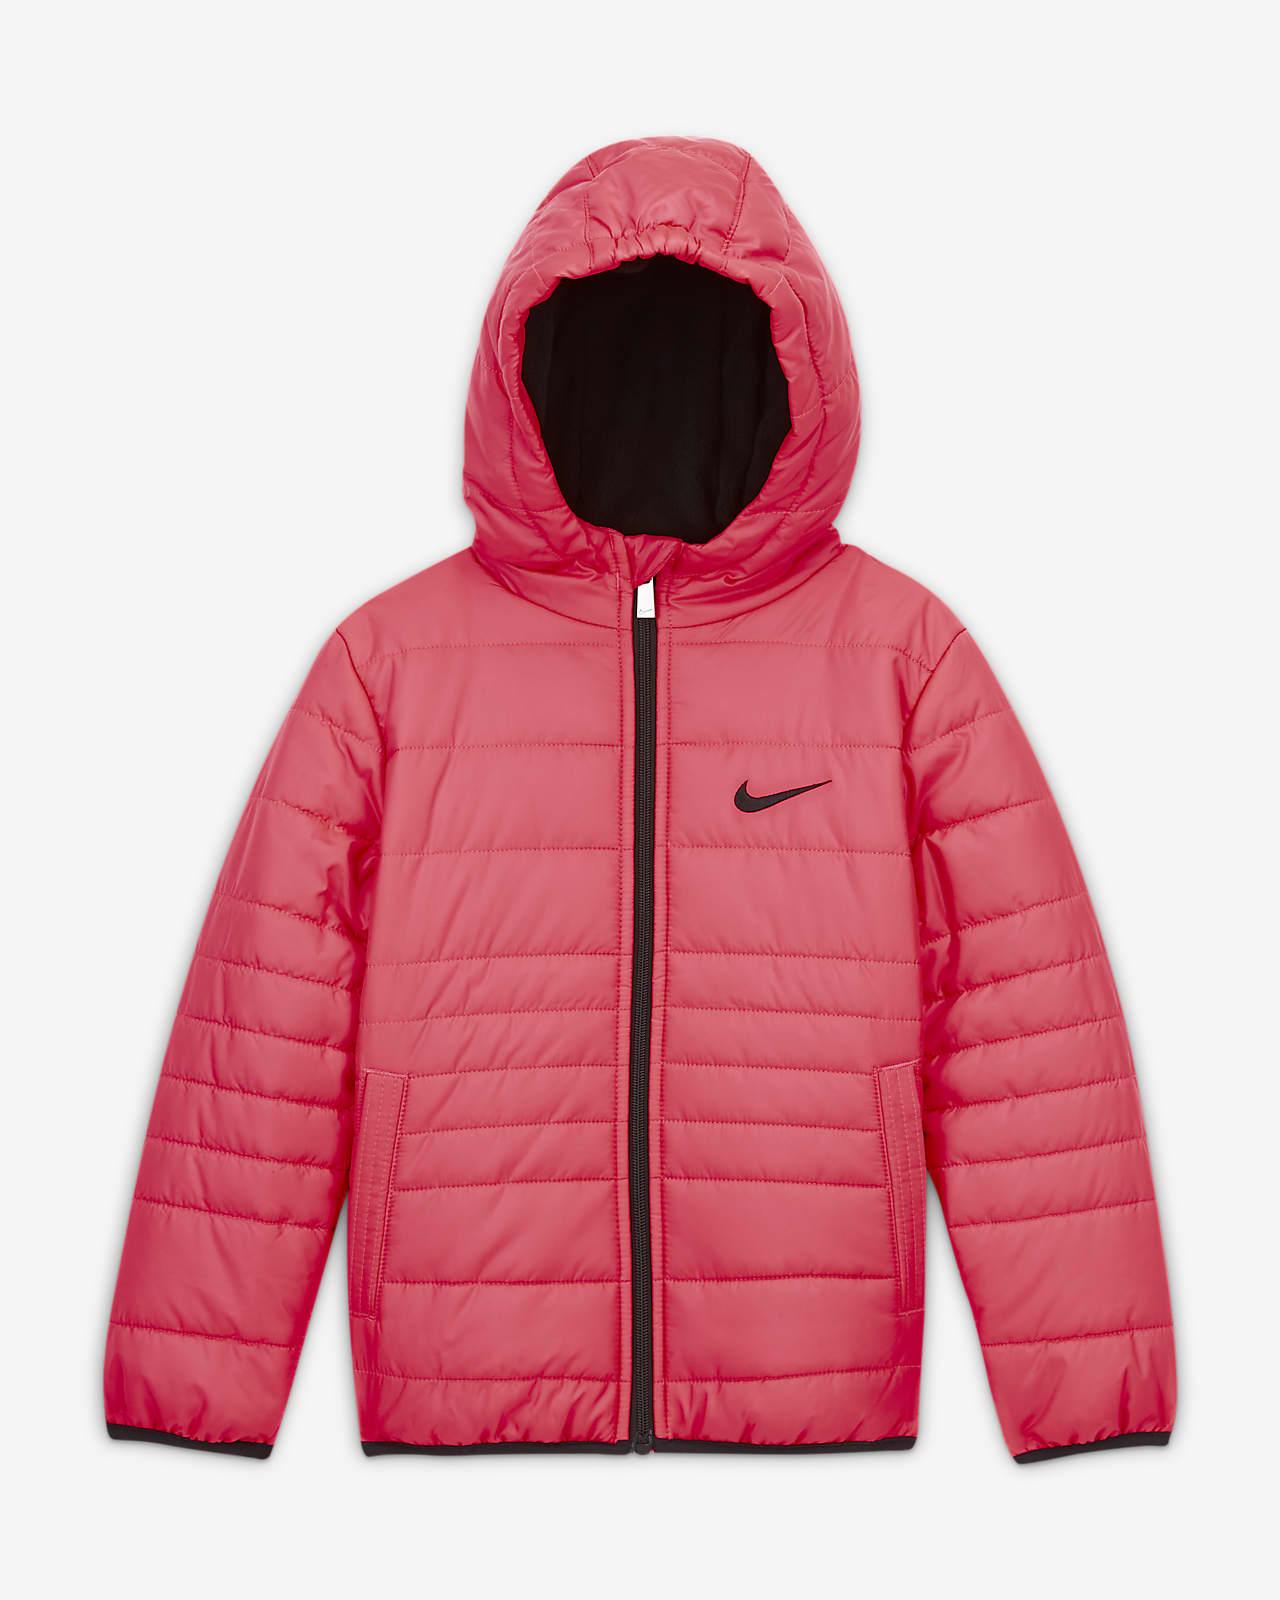 Nike Younger Kids' Puffer Jacket